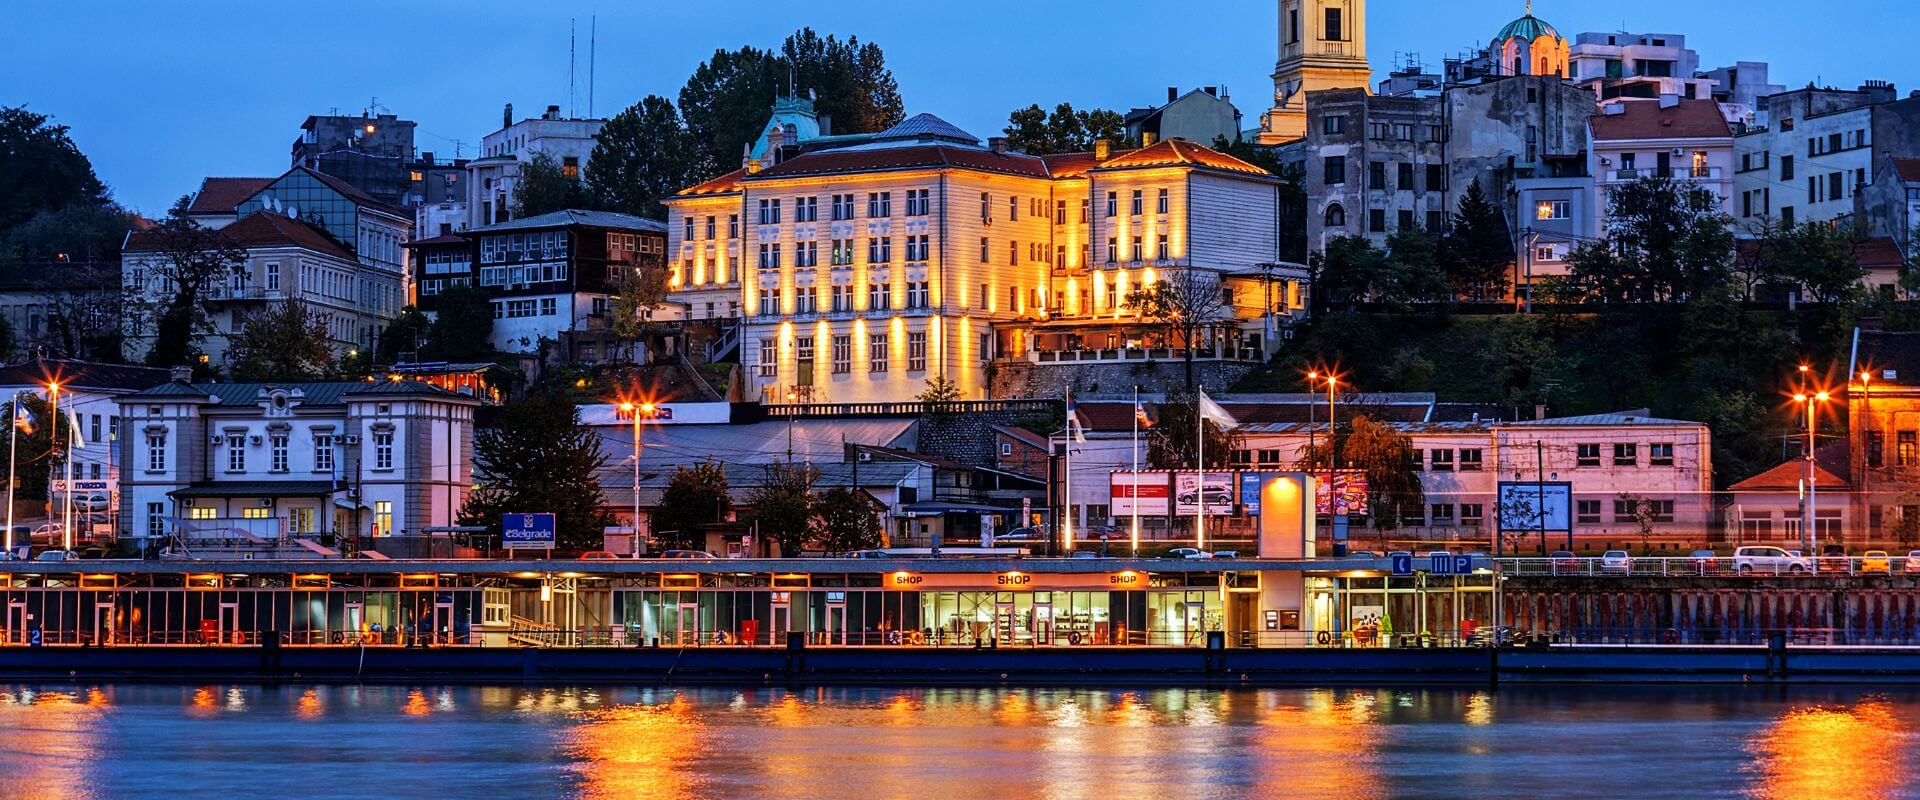 Bild Belgrad